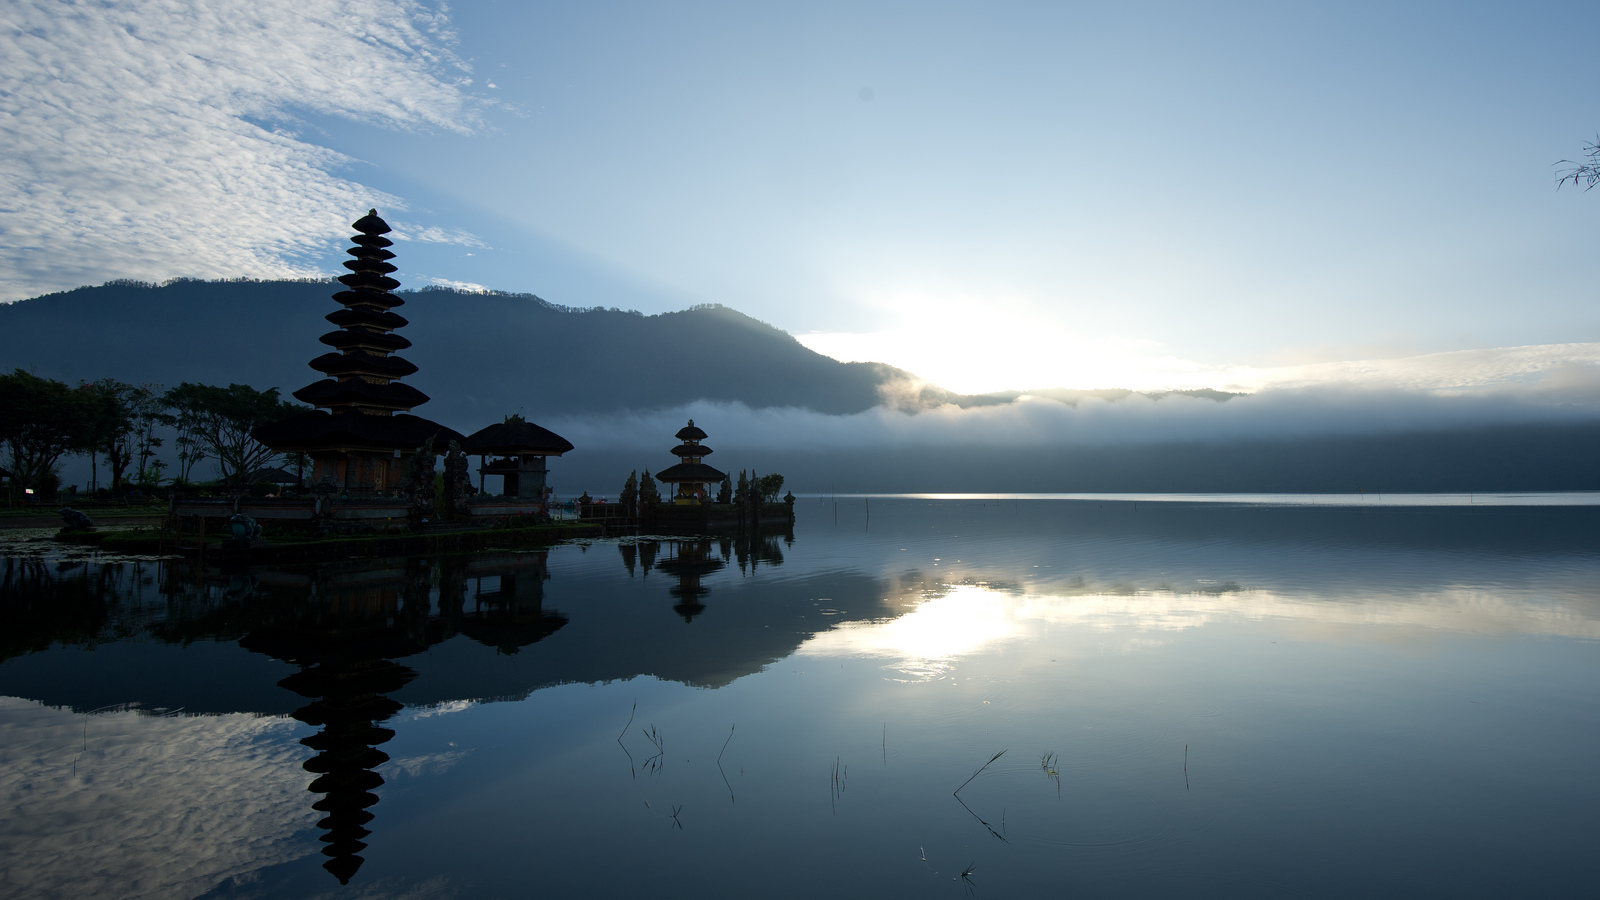 Pura Ulun Danu, Bali